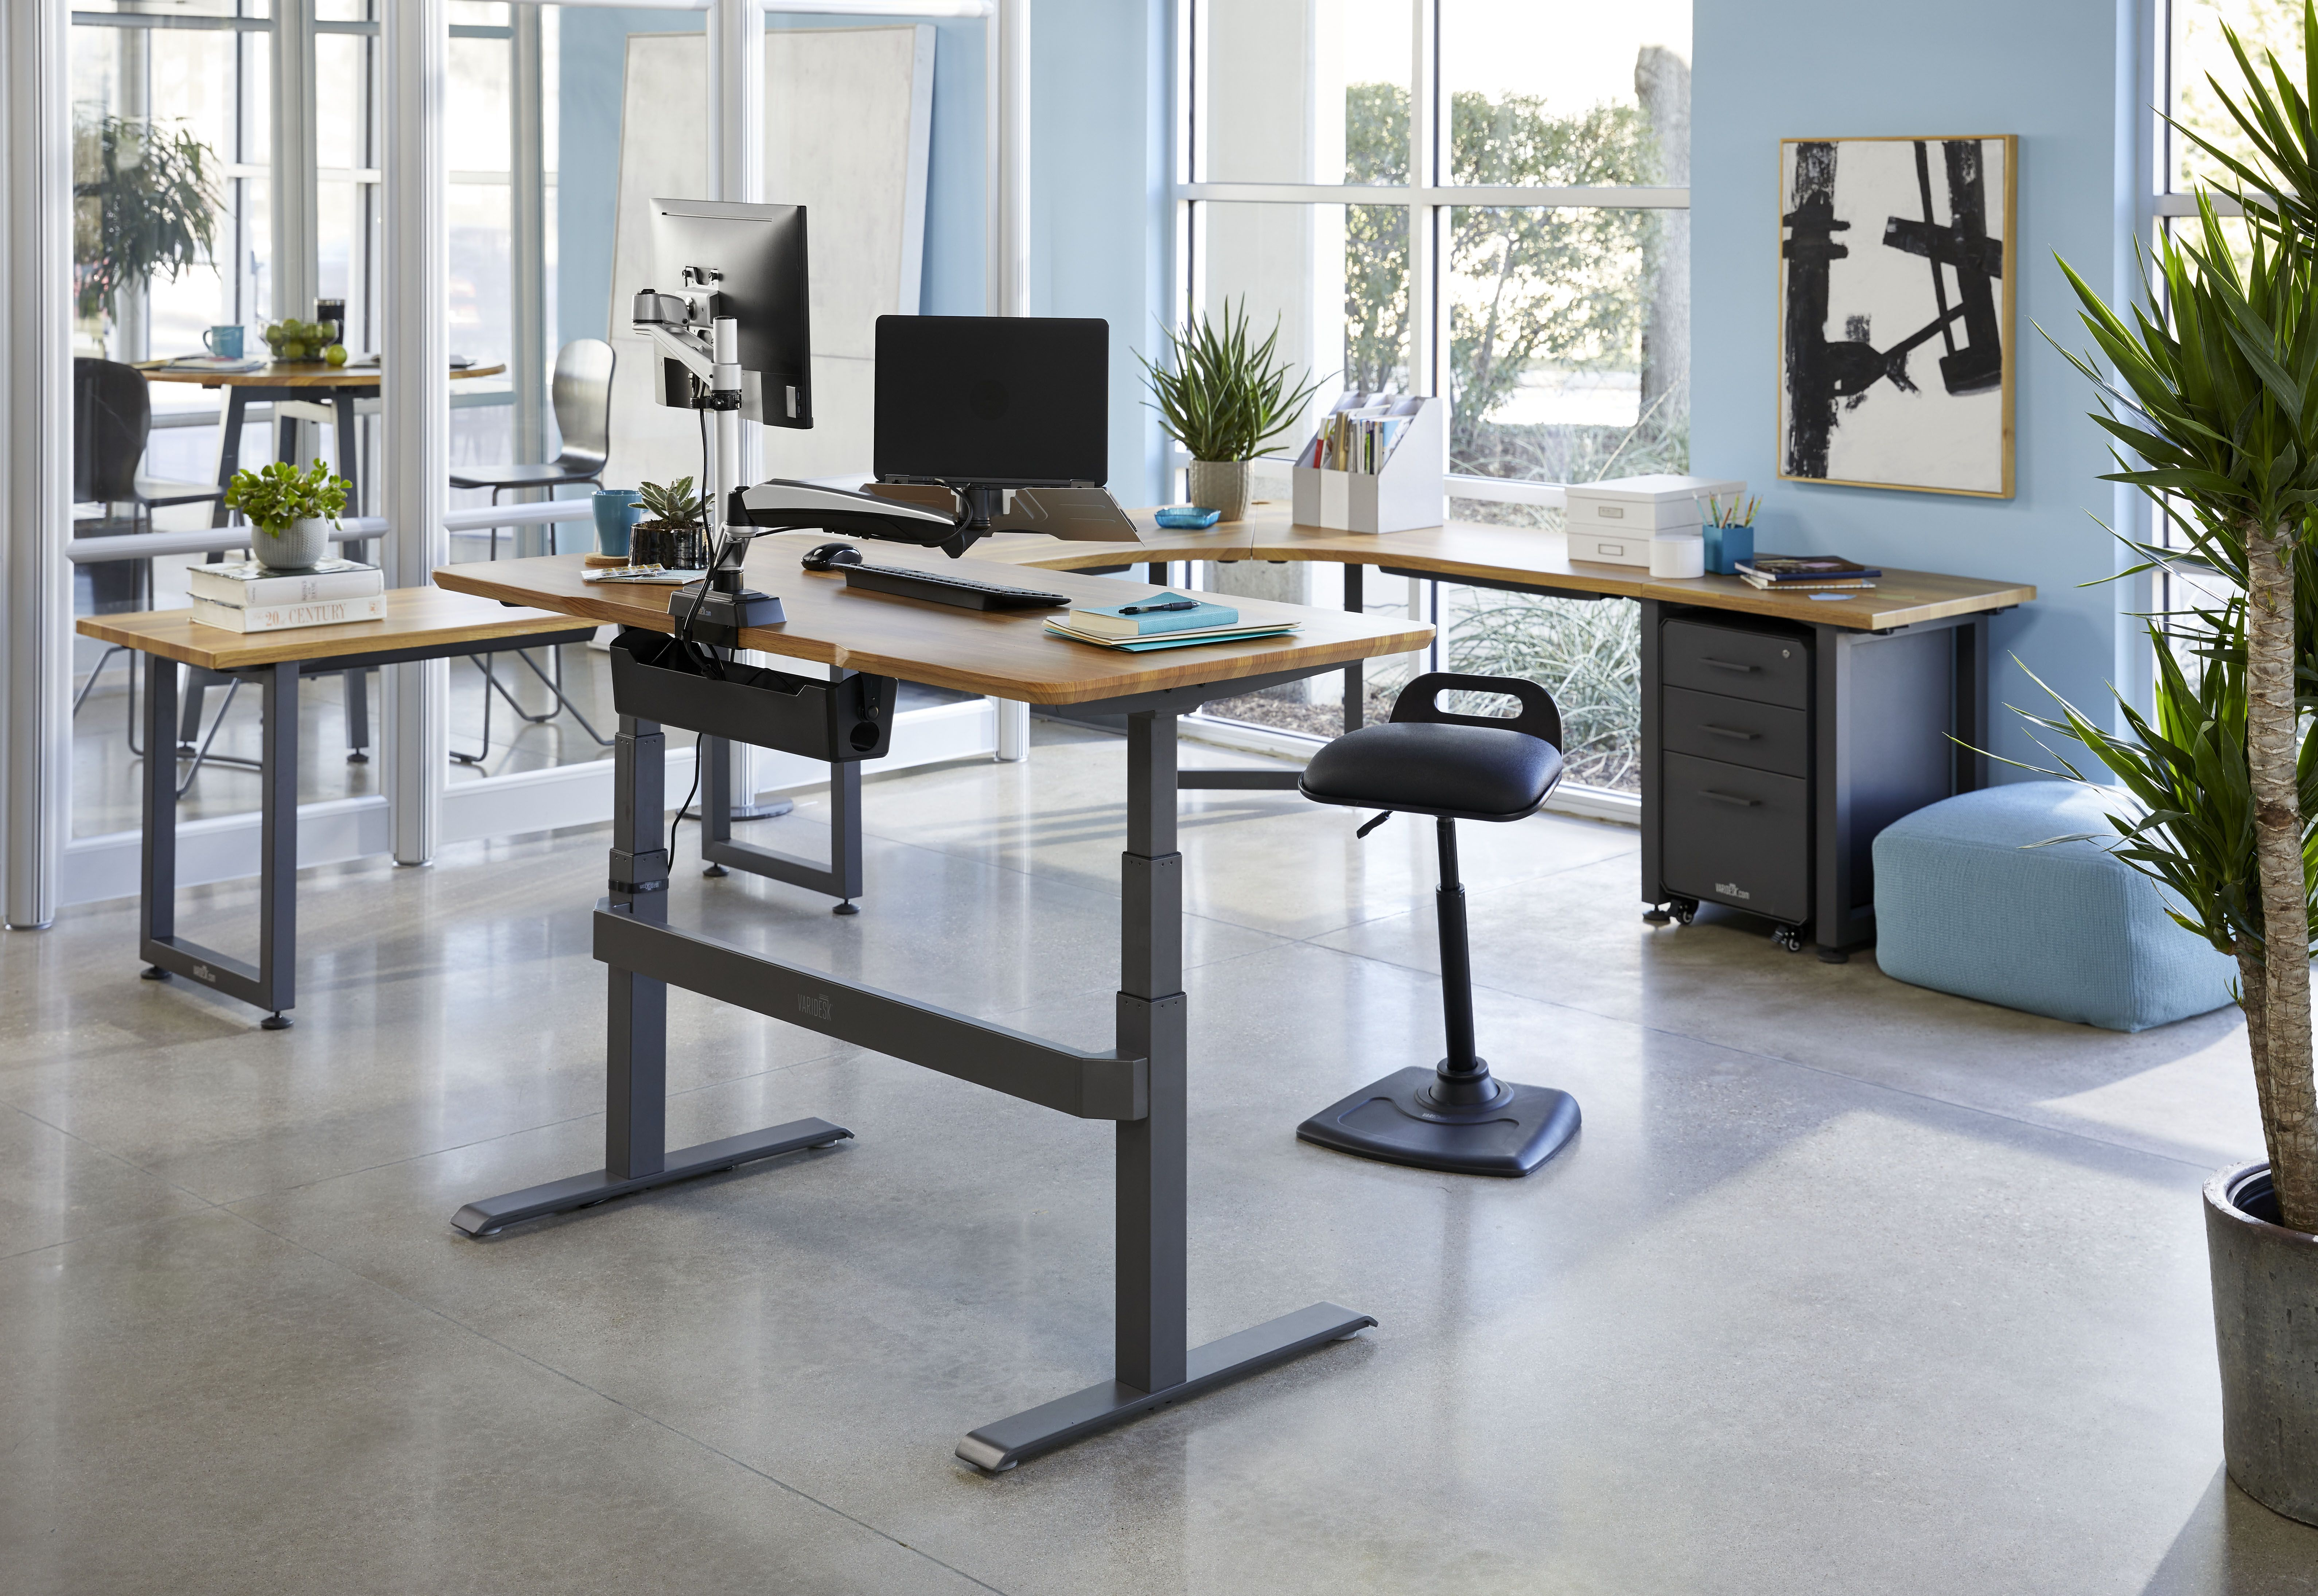 Flexible Office Design Standing Desk Inspiration Desk Inspiration Workspace Inspiration Redesign Furniture